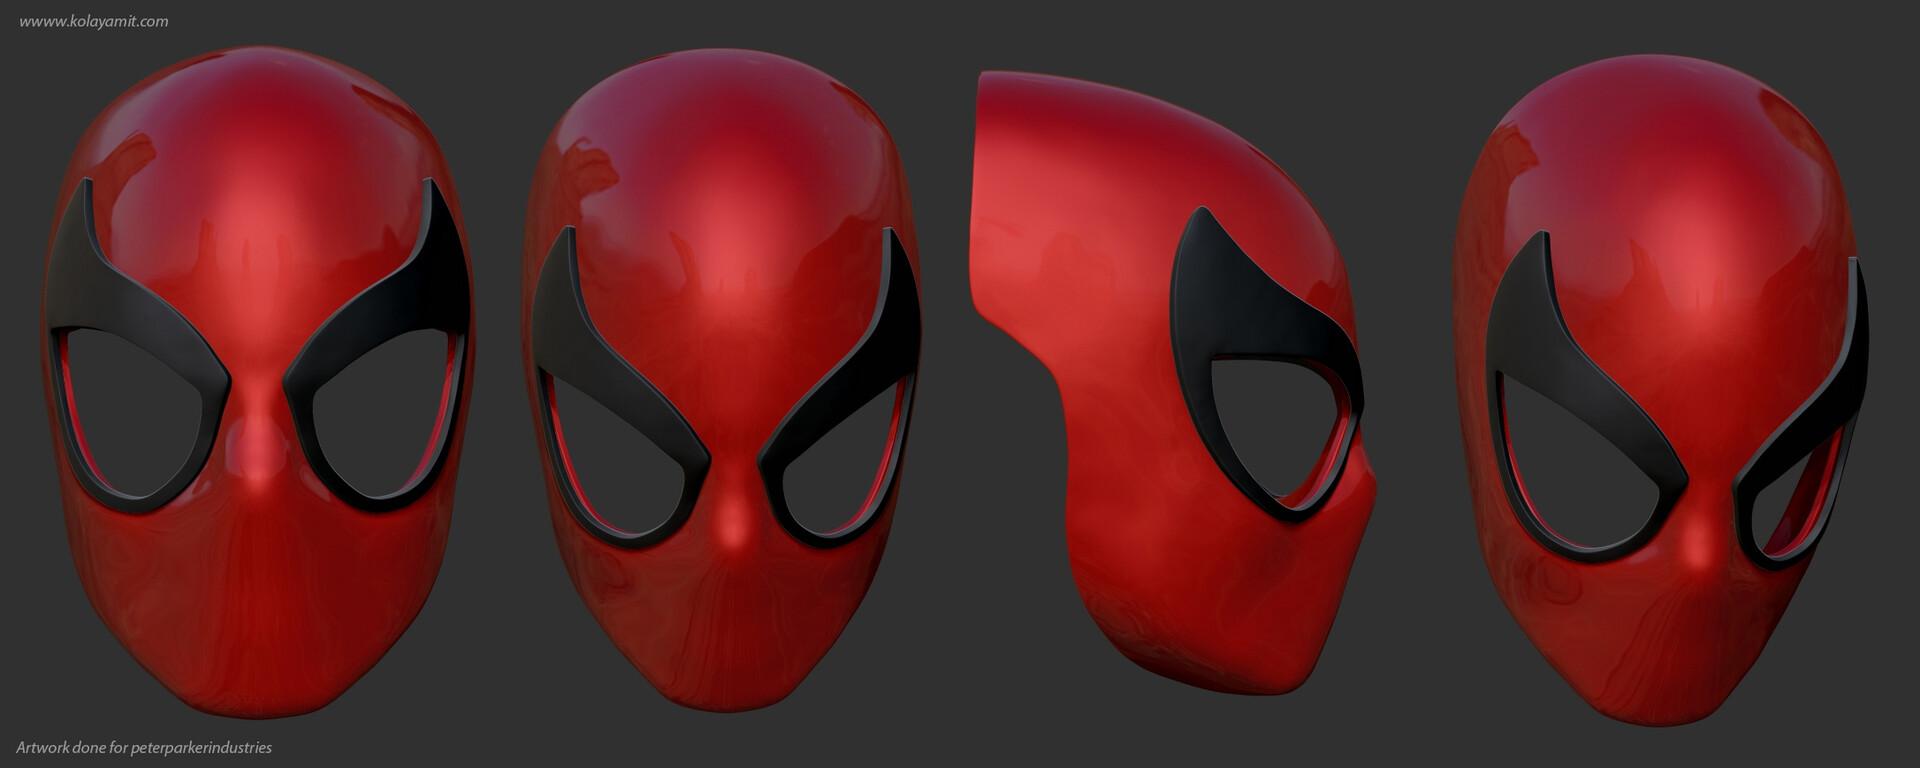 Amit kolay spidermanmask